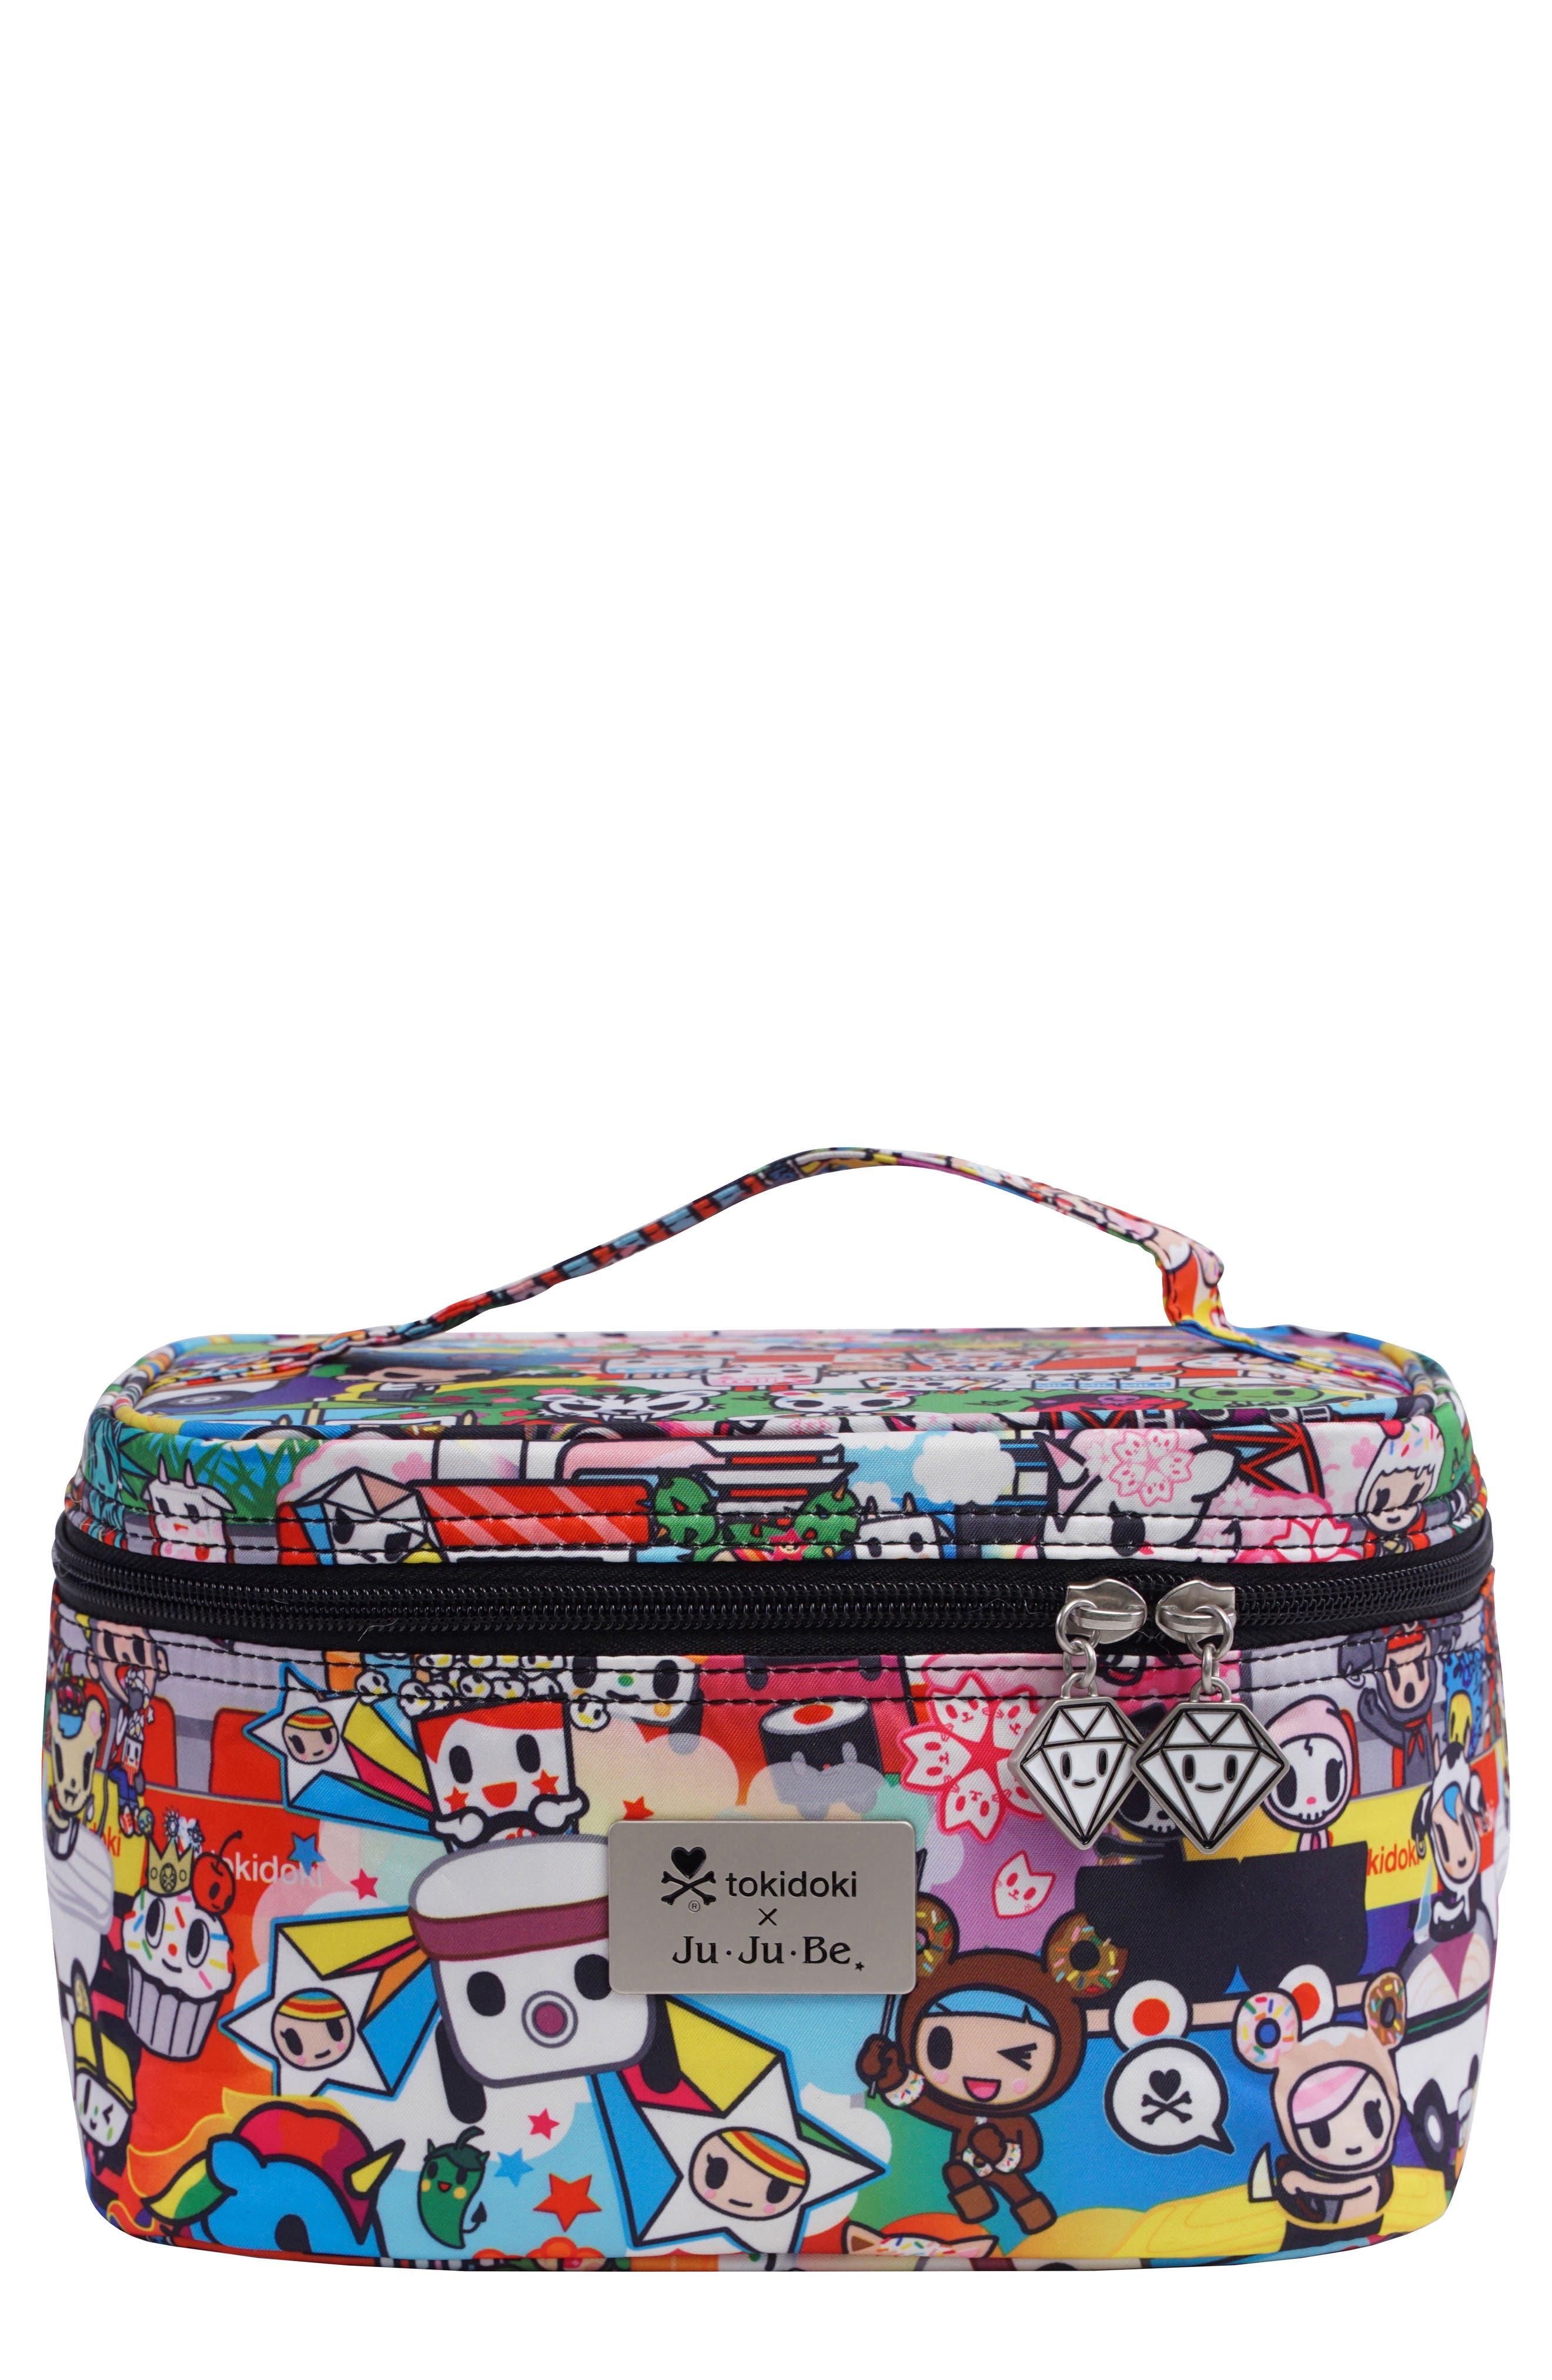 x tokidoki Be Ready Cosmetics Travel Case,                             Main thumbnail 1, color,                             SUSHI CARS